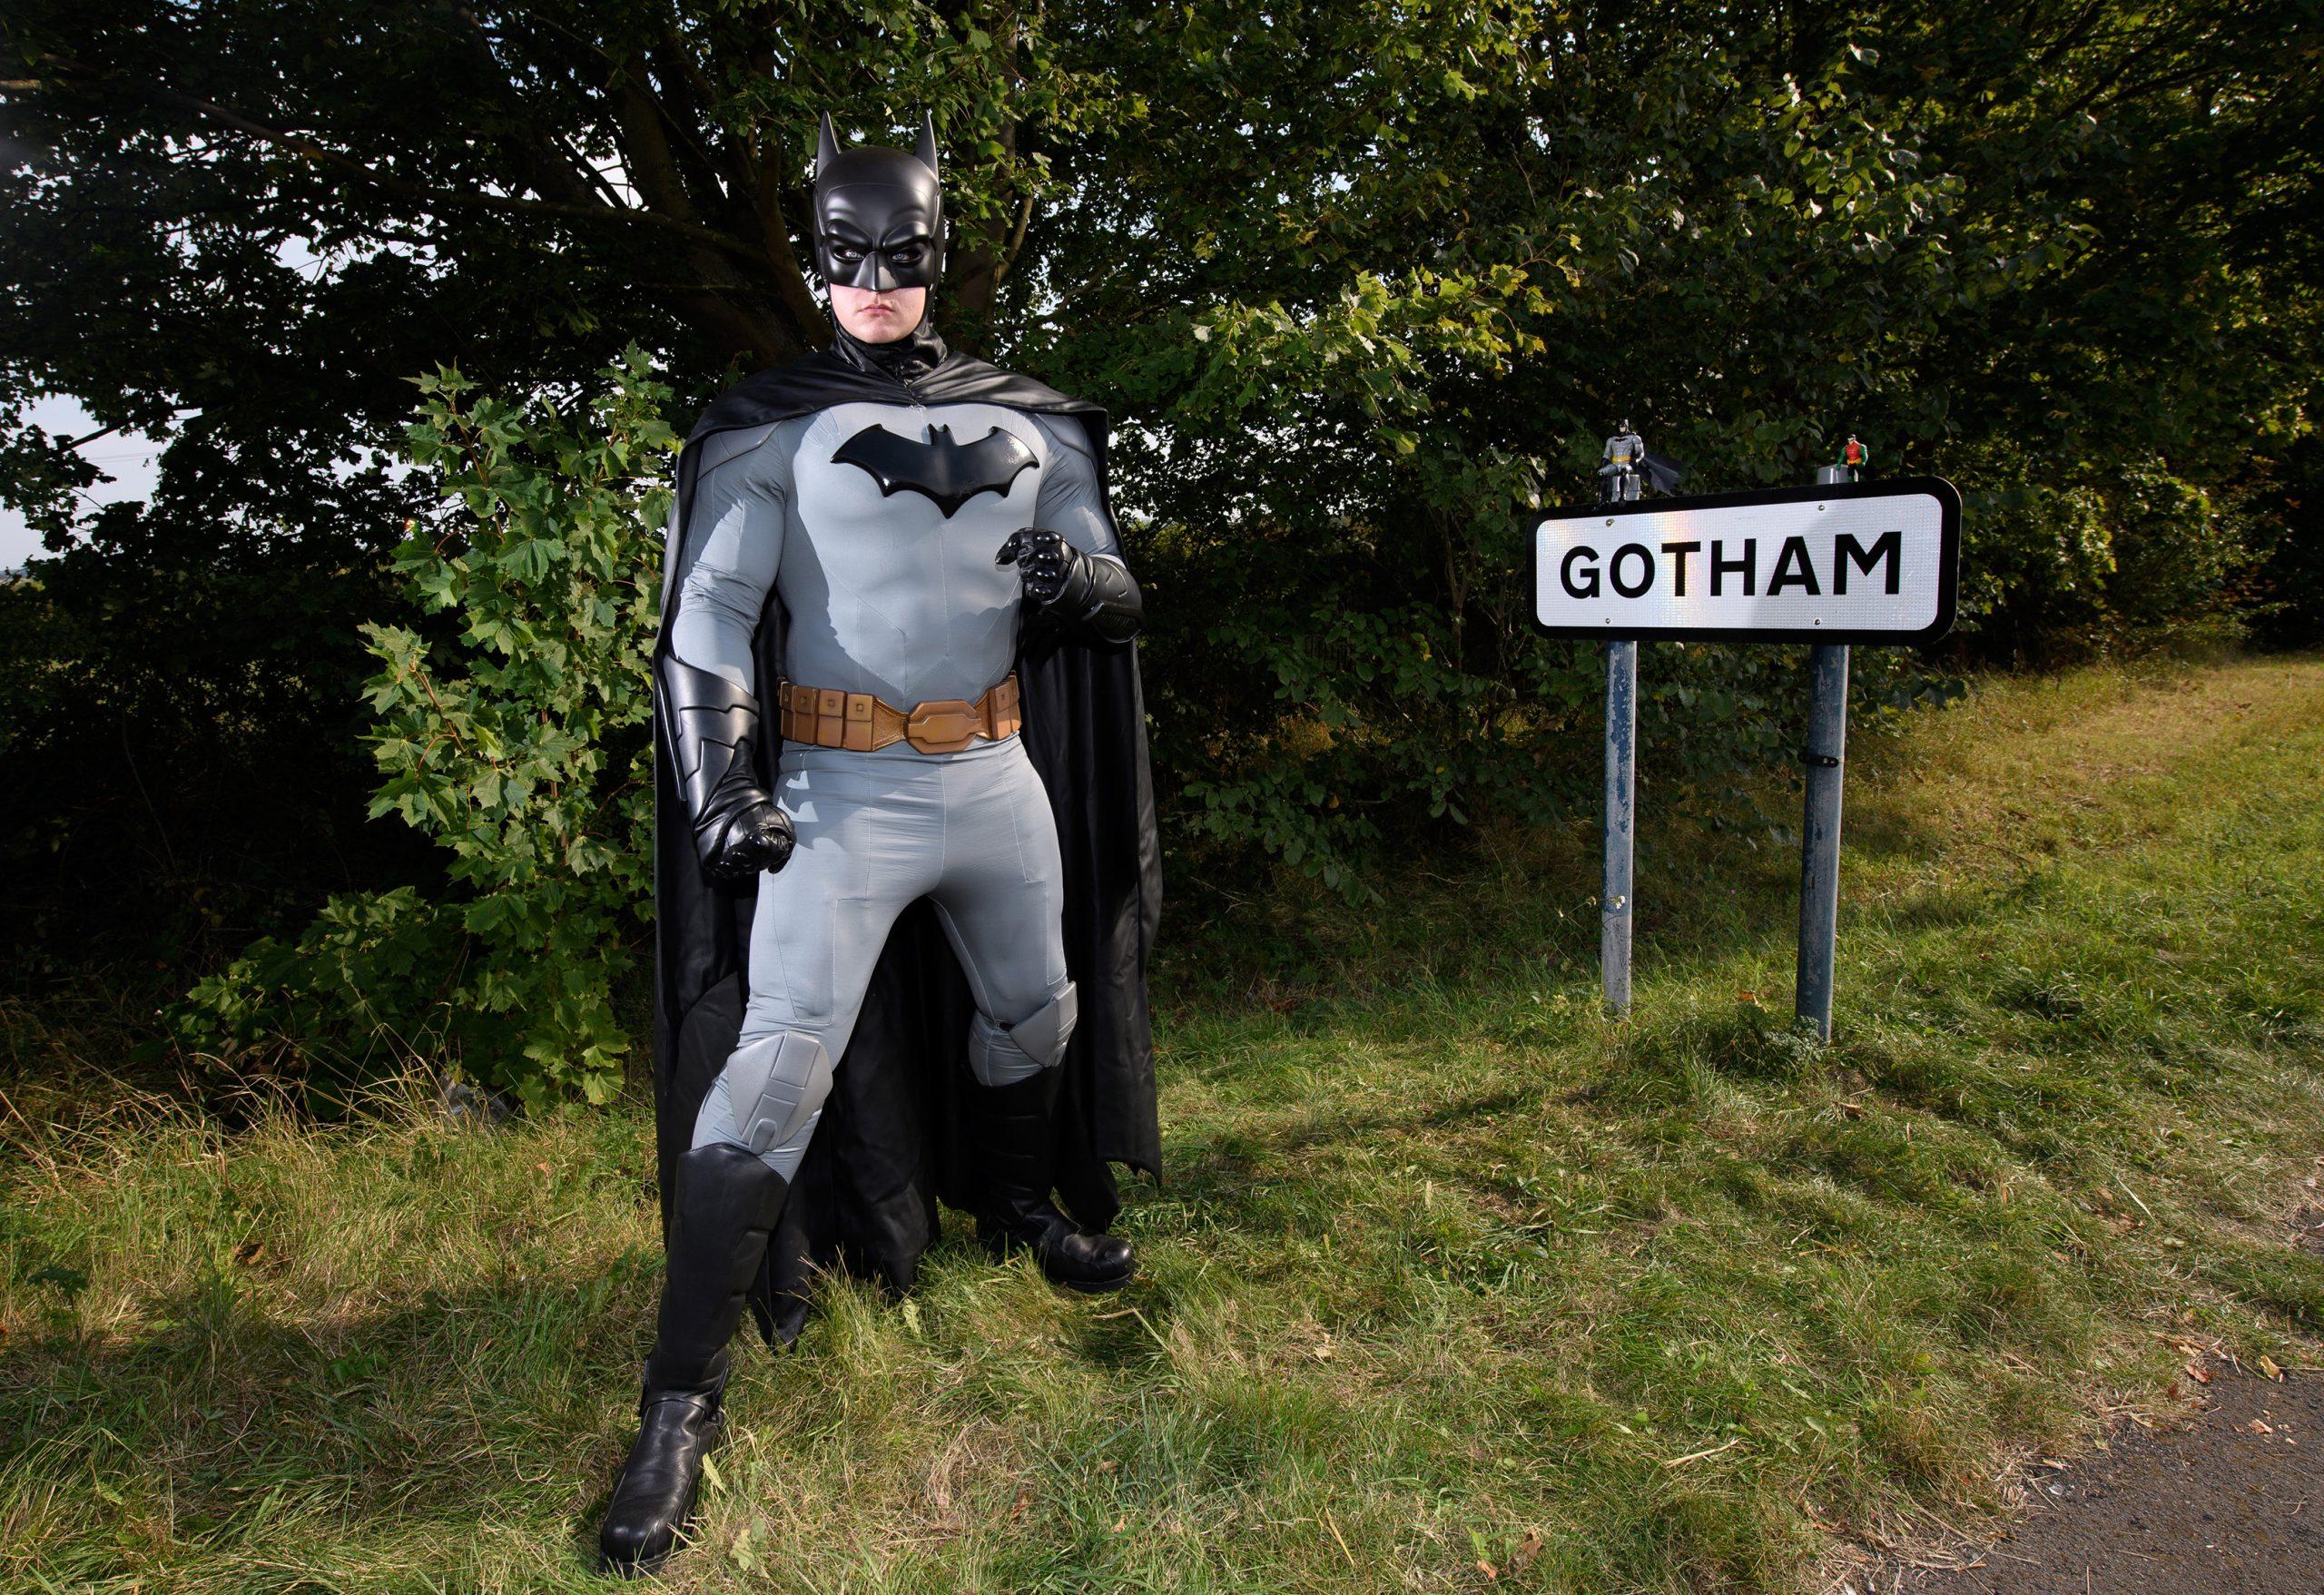 Batman delivers toys to Gotham ahead of Batman Day